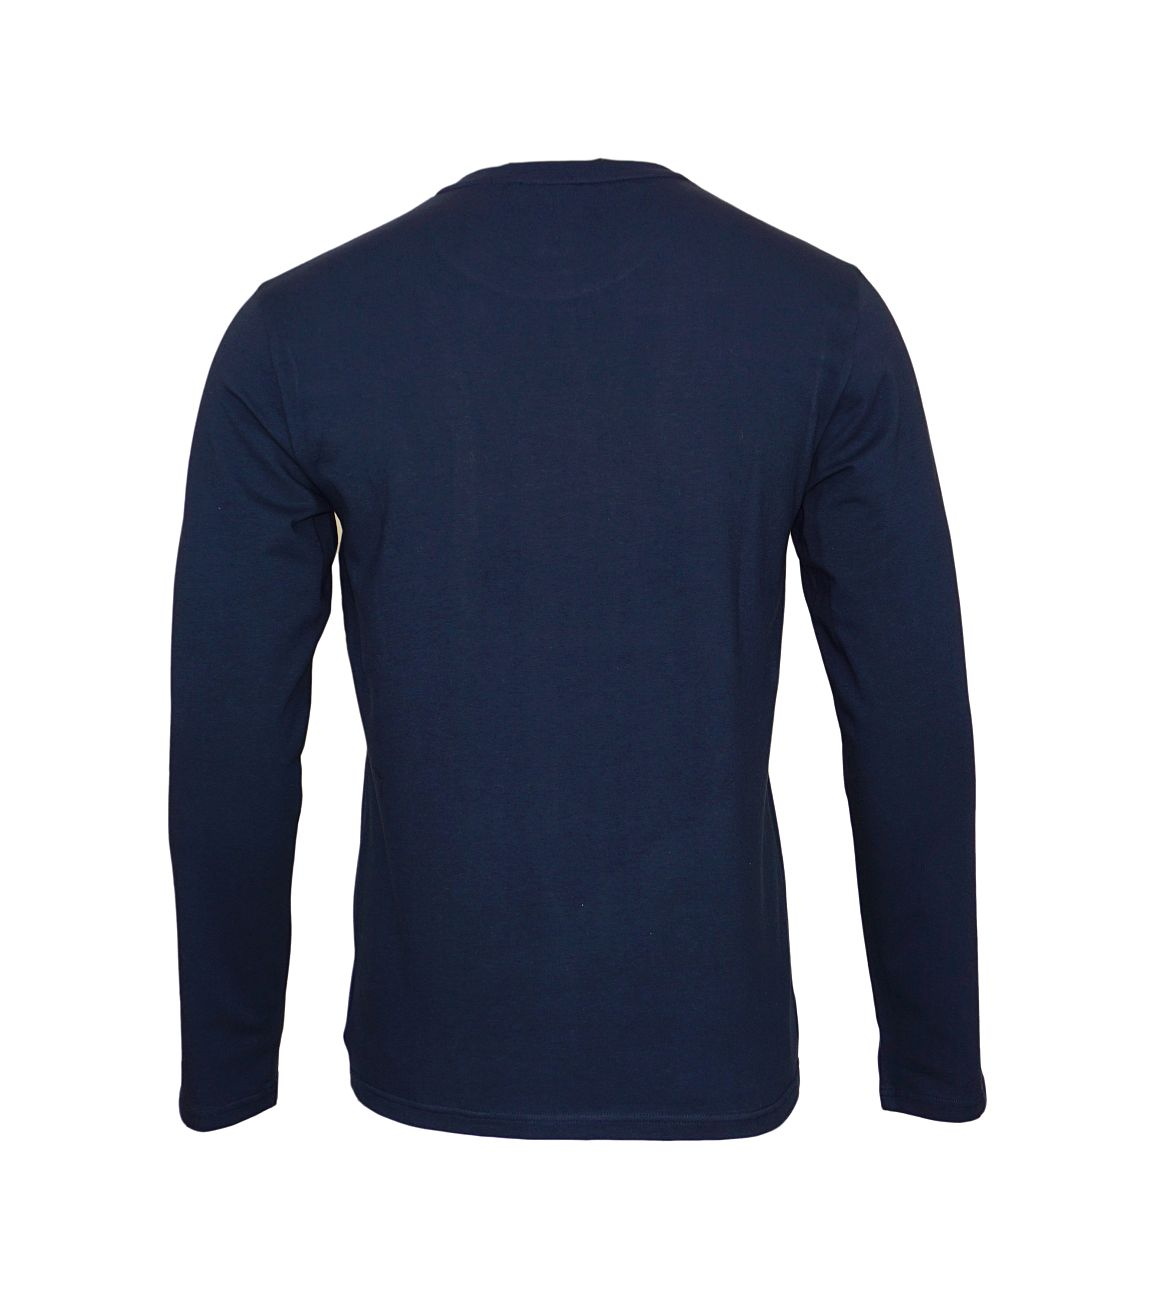 Emporio Armani Longsleeve Rundhals Shirt 111653 8A516 00135 MARINE WX18-EAL